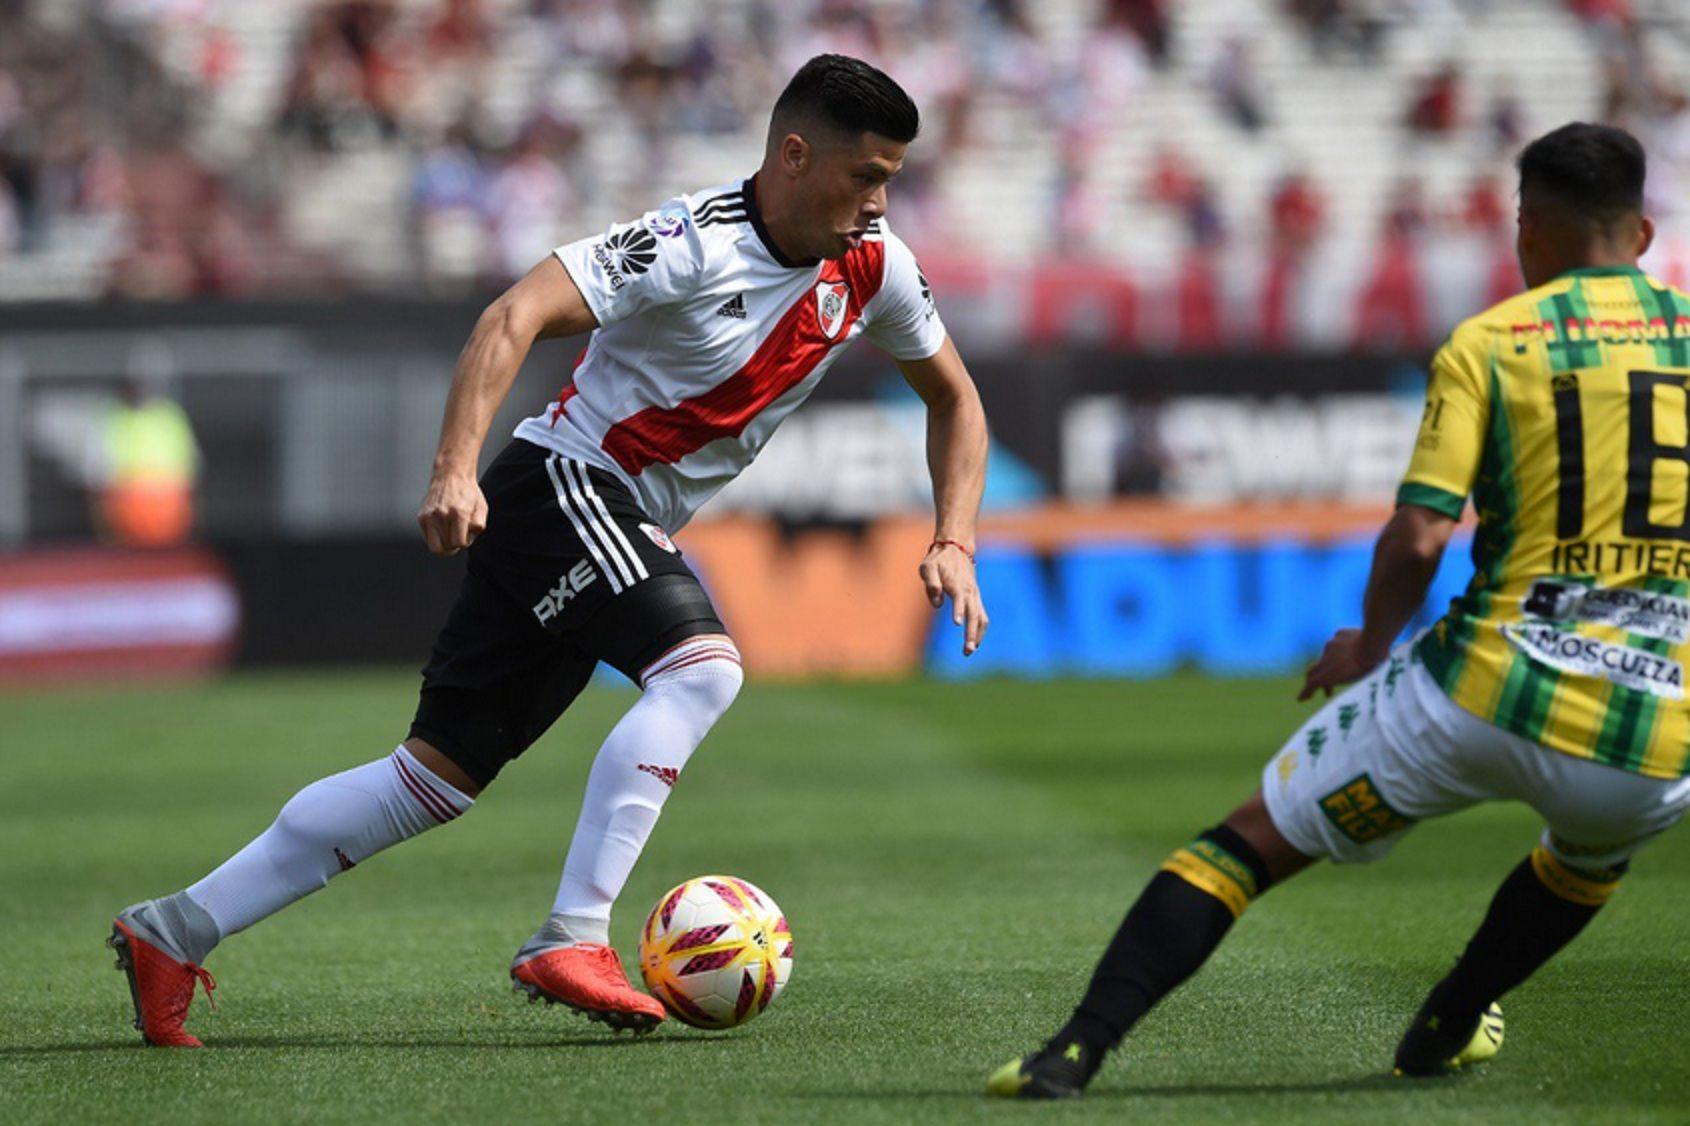 Con muchos suplentes, River le ganó a Aldosivi en Núñez